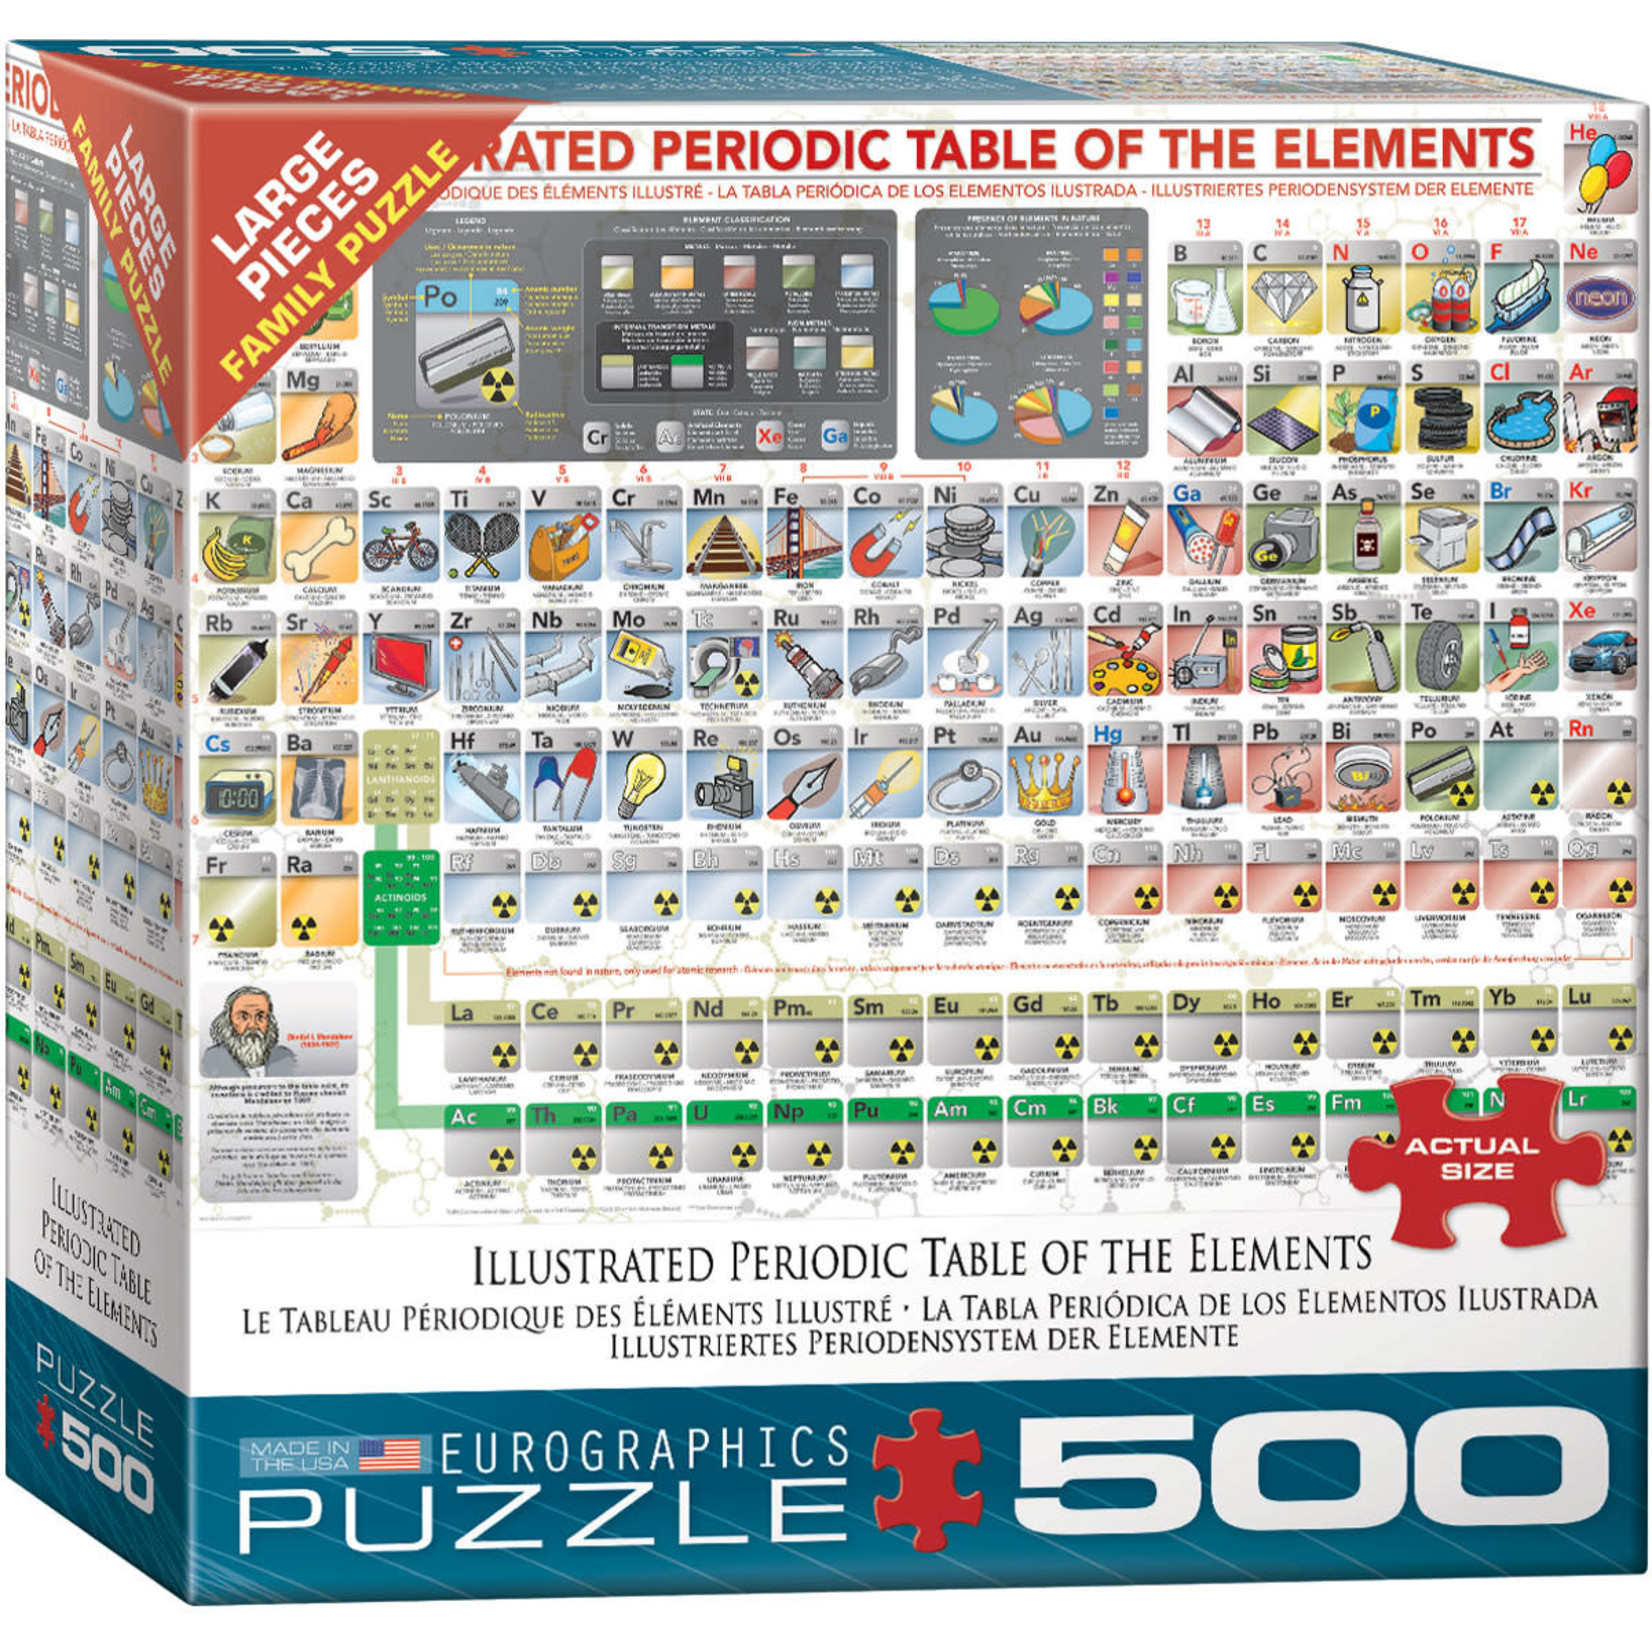 Eurographics Eurographics Puzzle: Illustrated Periodic Table - 500pc